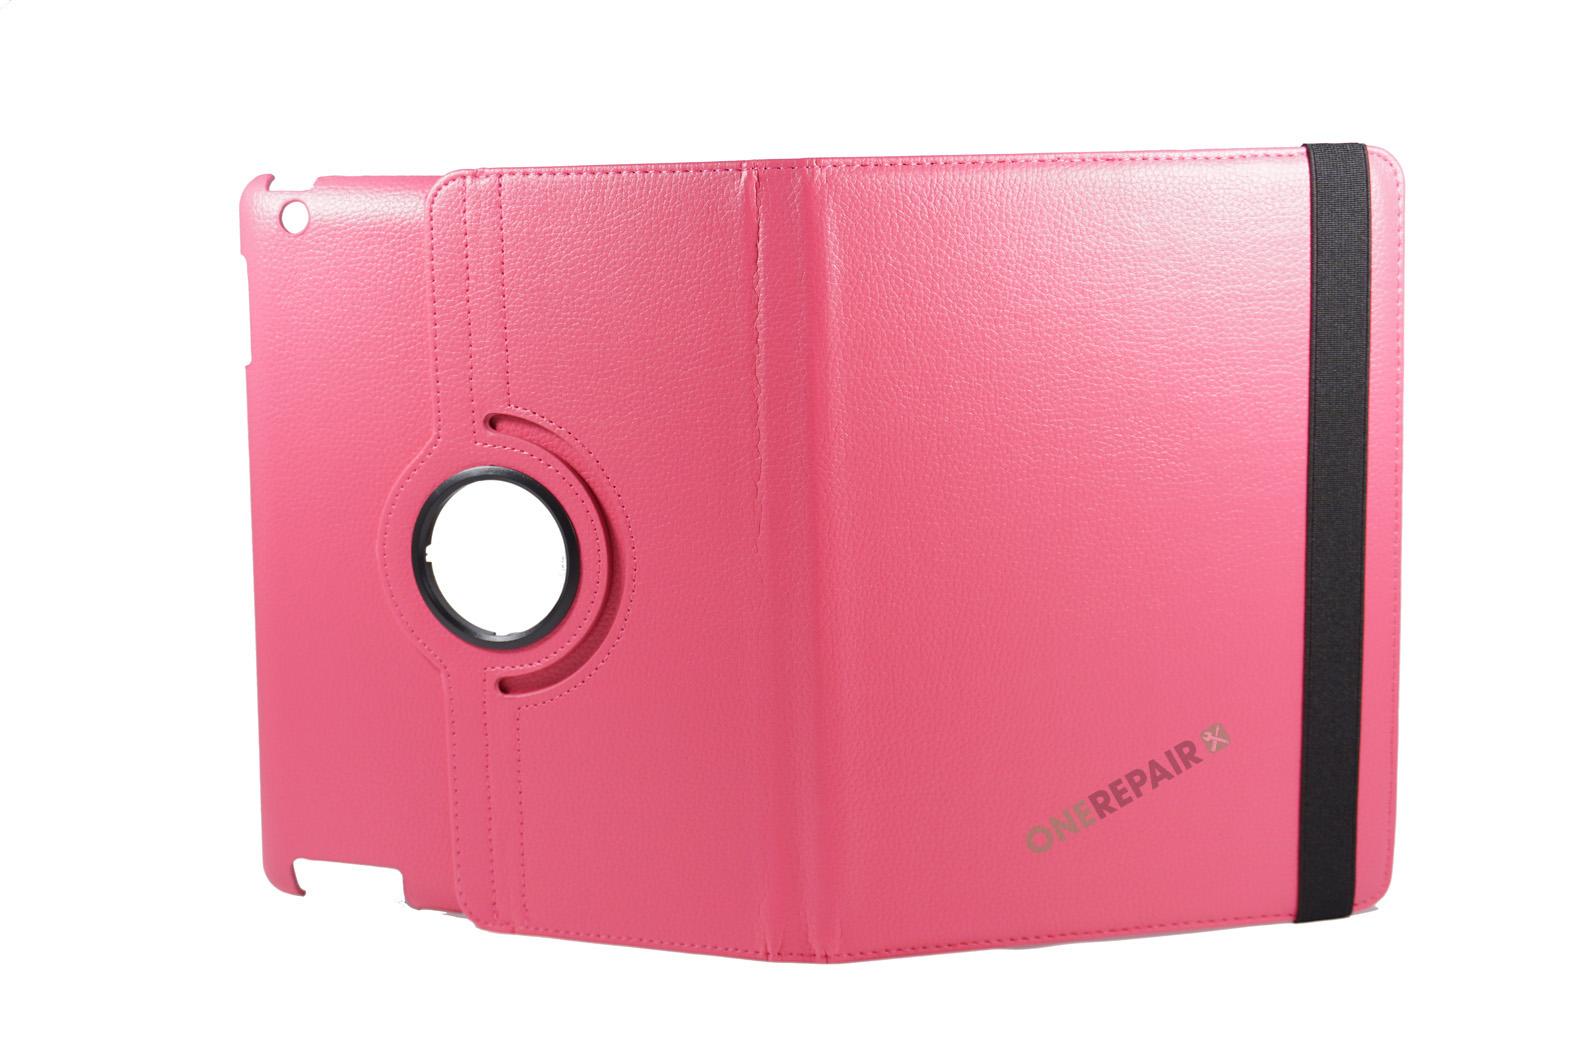 351032_iPad_2_3_4_A1395_A1396_A1430_A1403_1458_A1459_A1460_A1397_Flipcover_Classic_360_Cover_Lyseroed_Pink_Billig_Godt_Beskyttelse_OneRepair_WM_00004